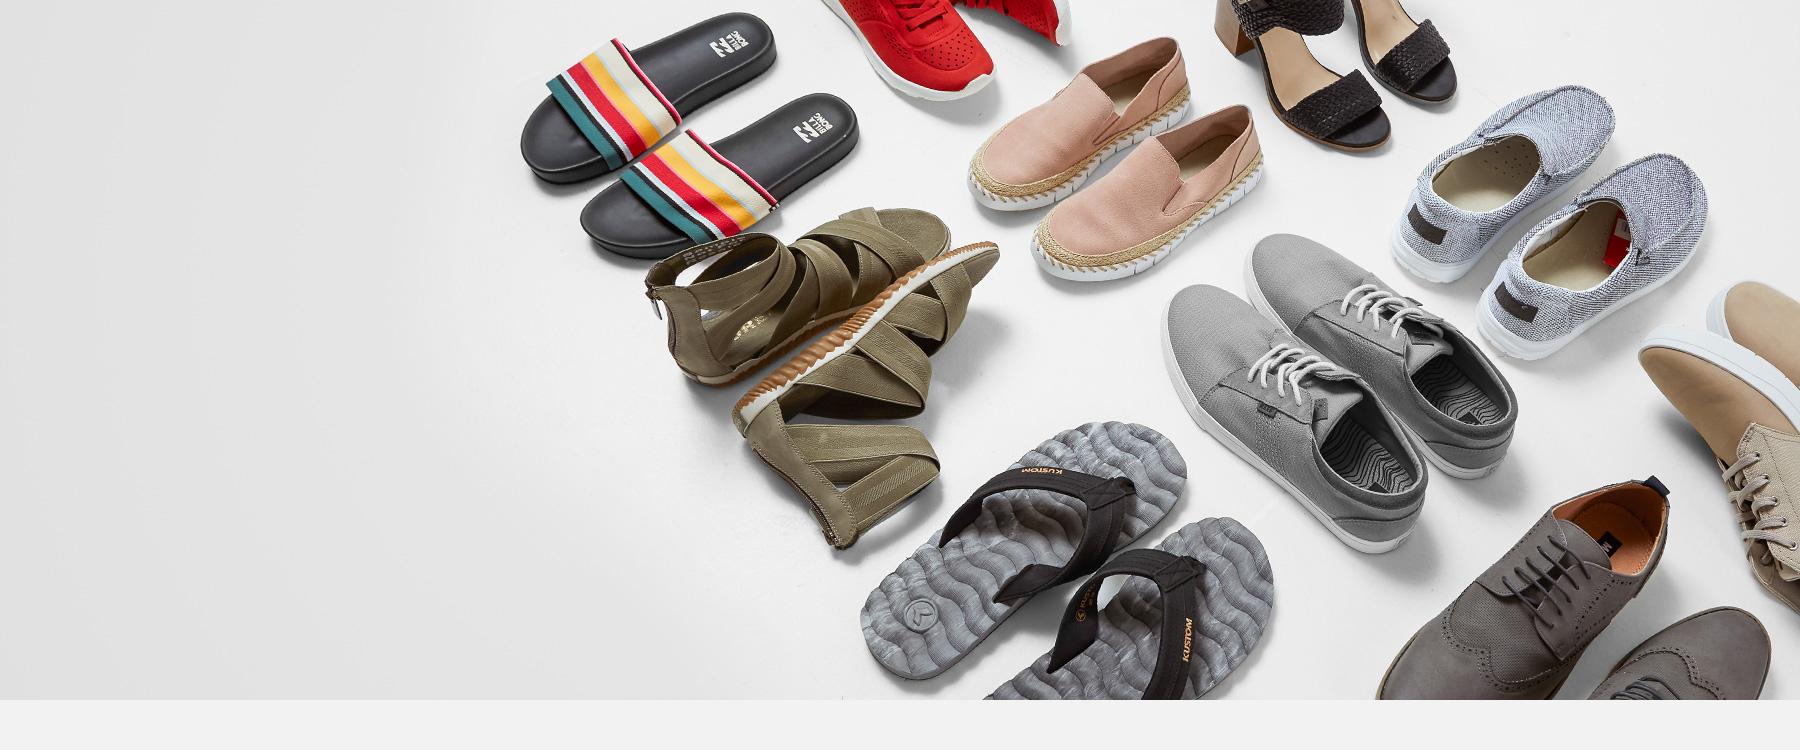 Ten pairs of men's and women's shoes